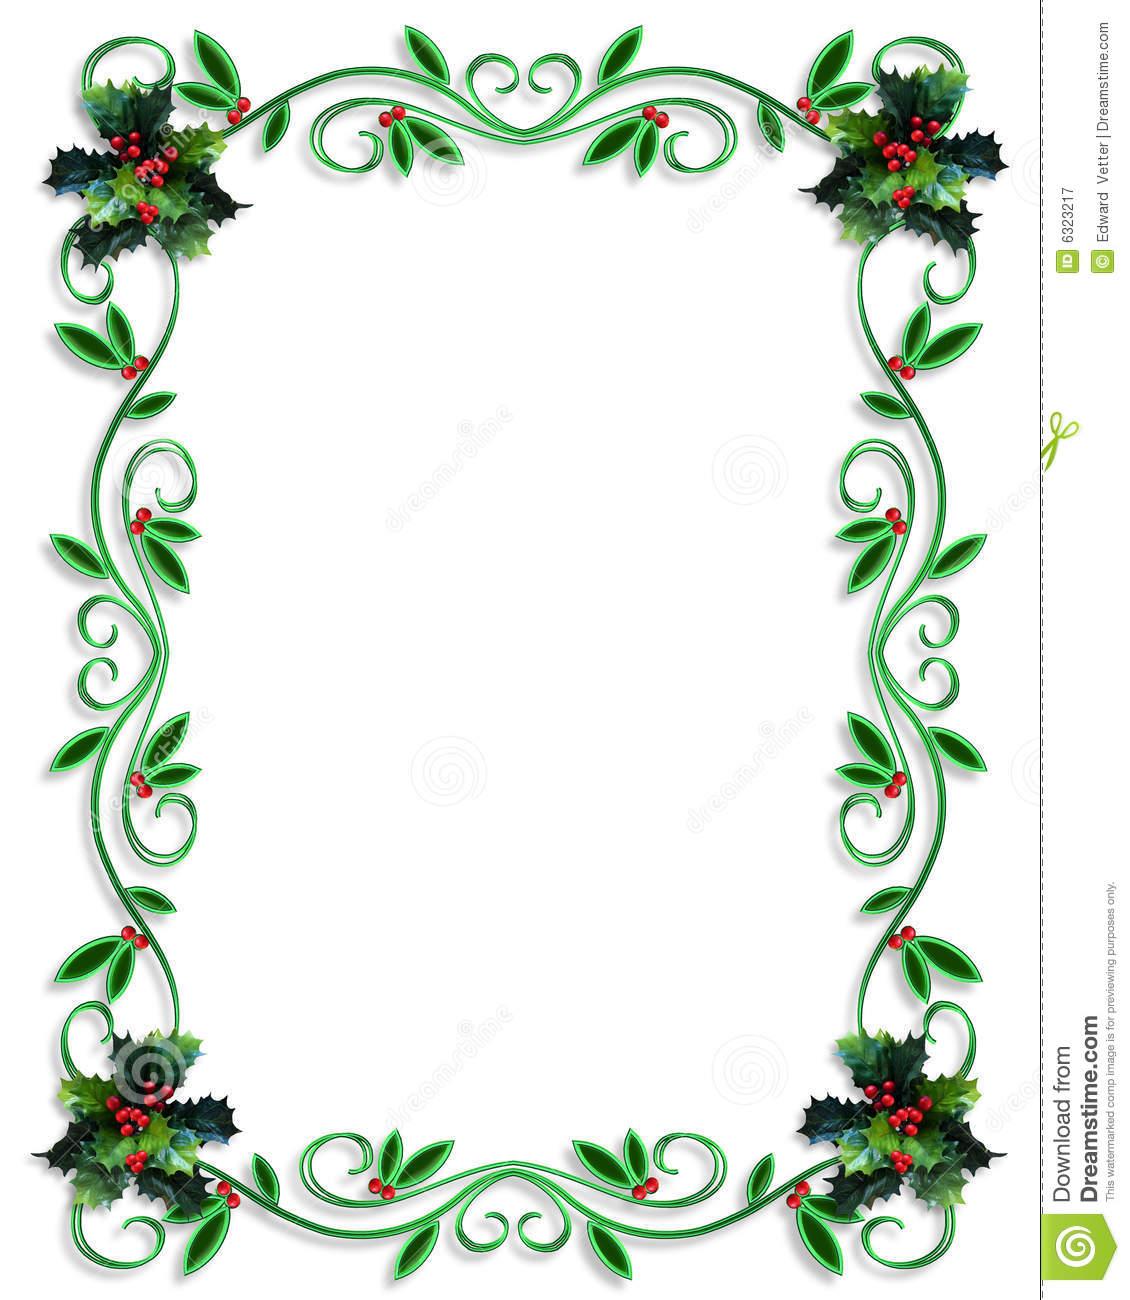 Christmas Border Designs